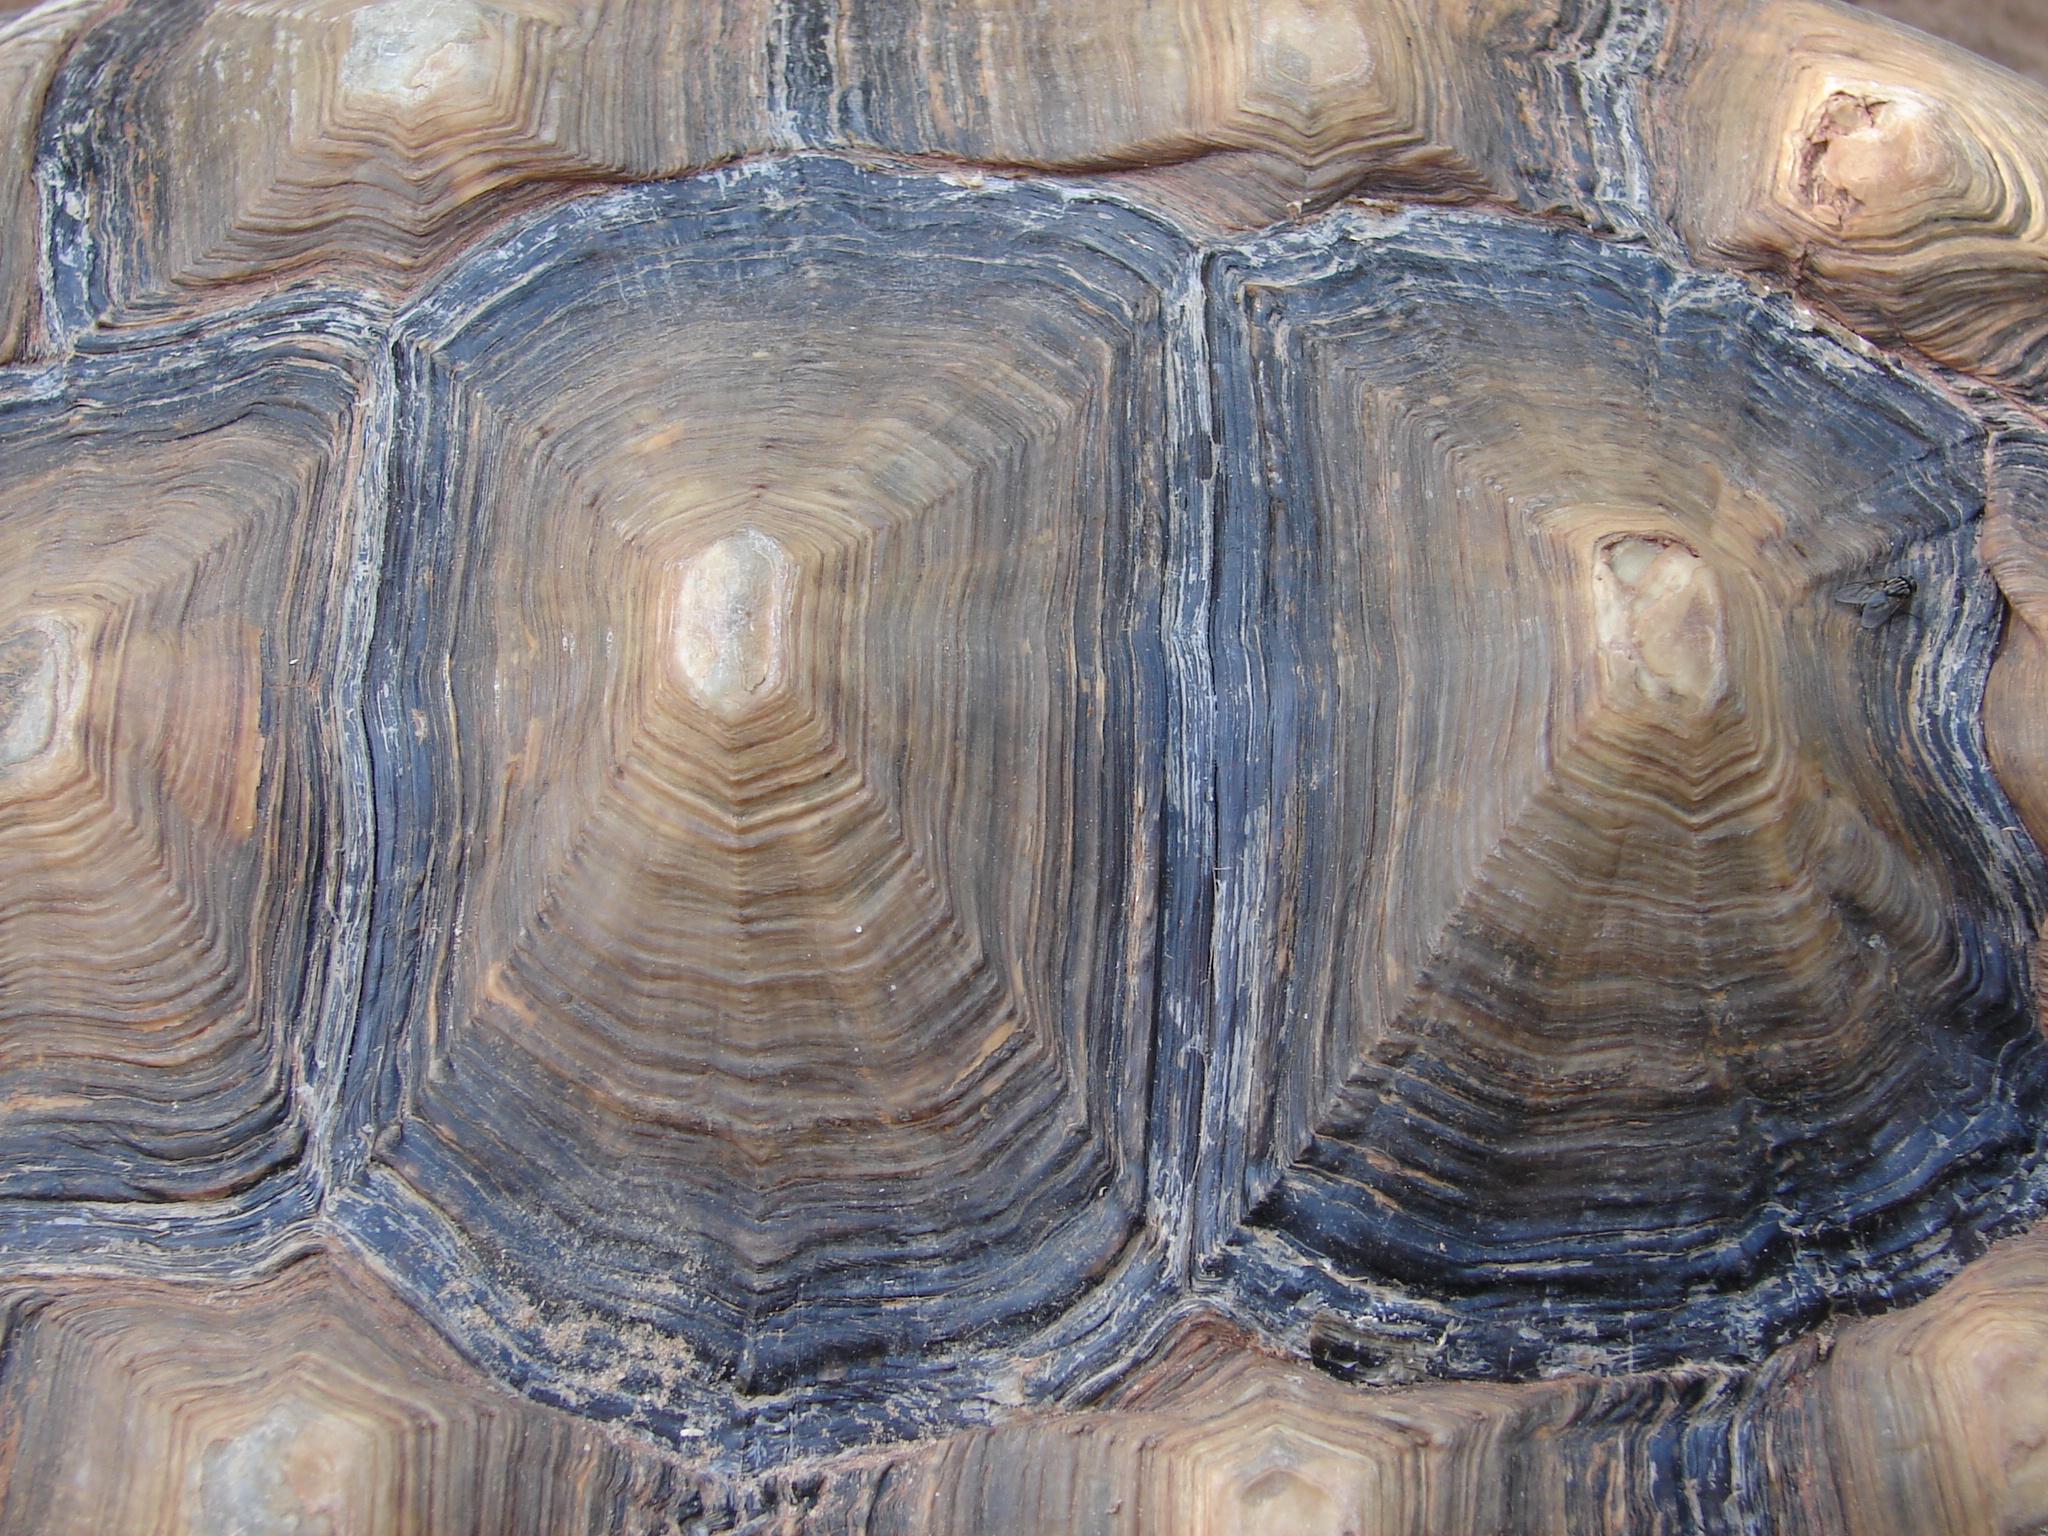 Bumpy Tortoise Shell Texture by FantasyStock